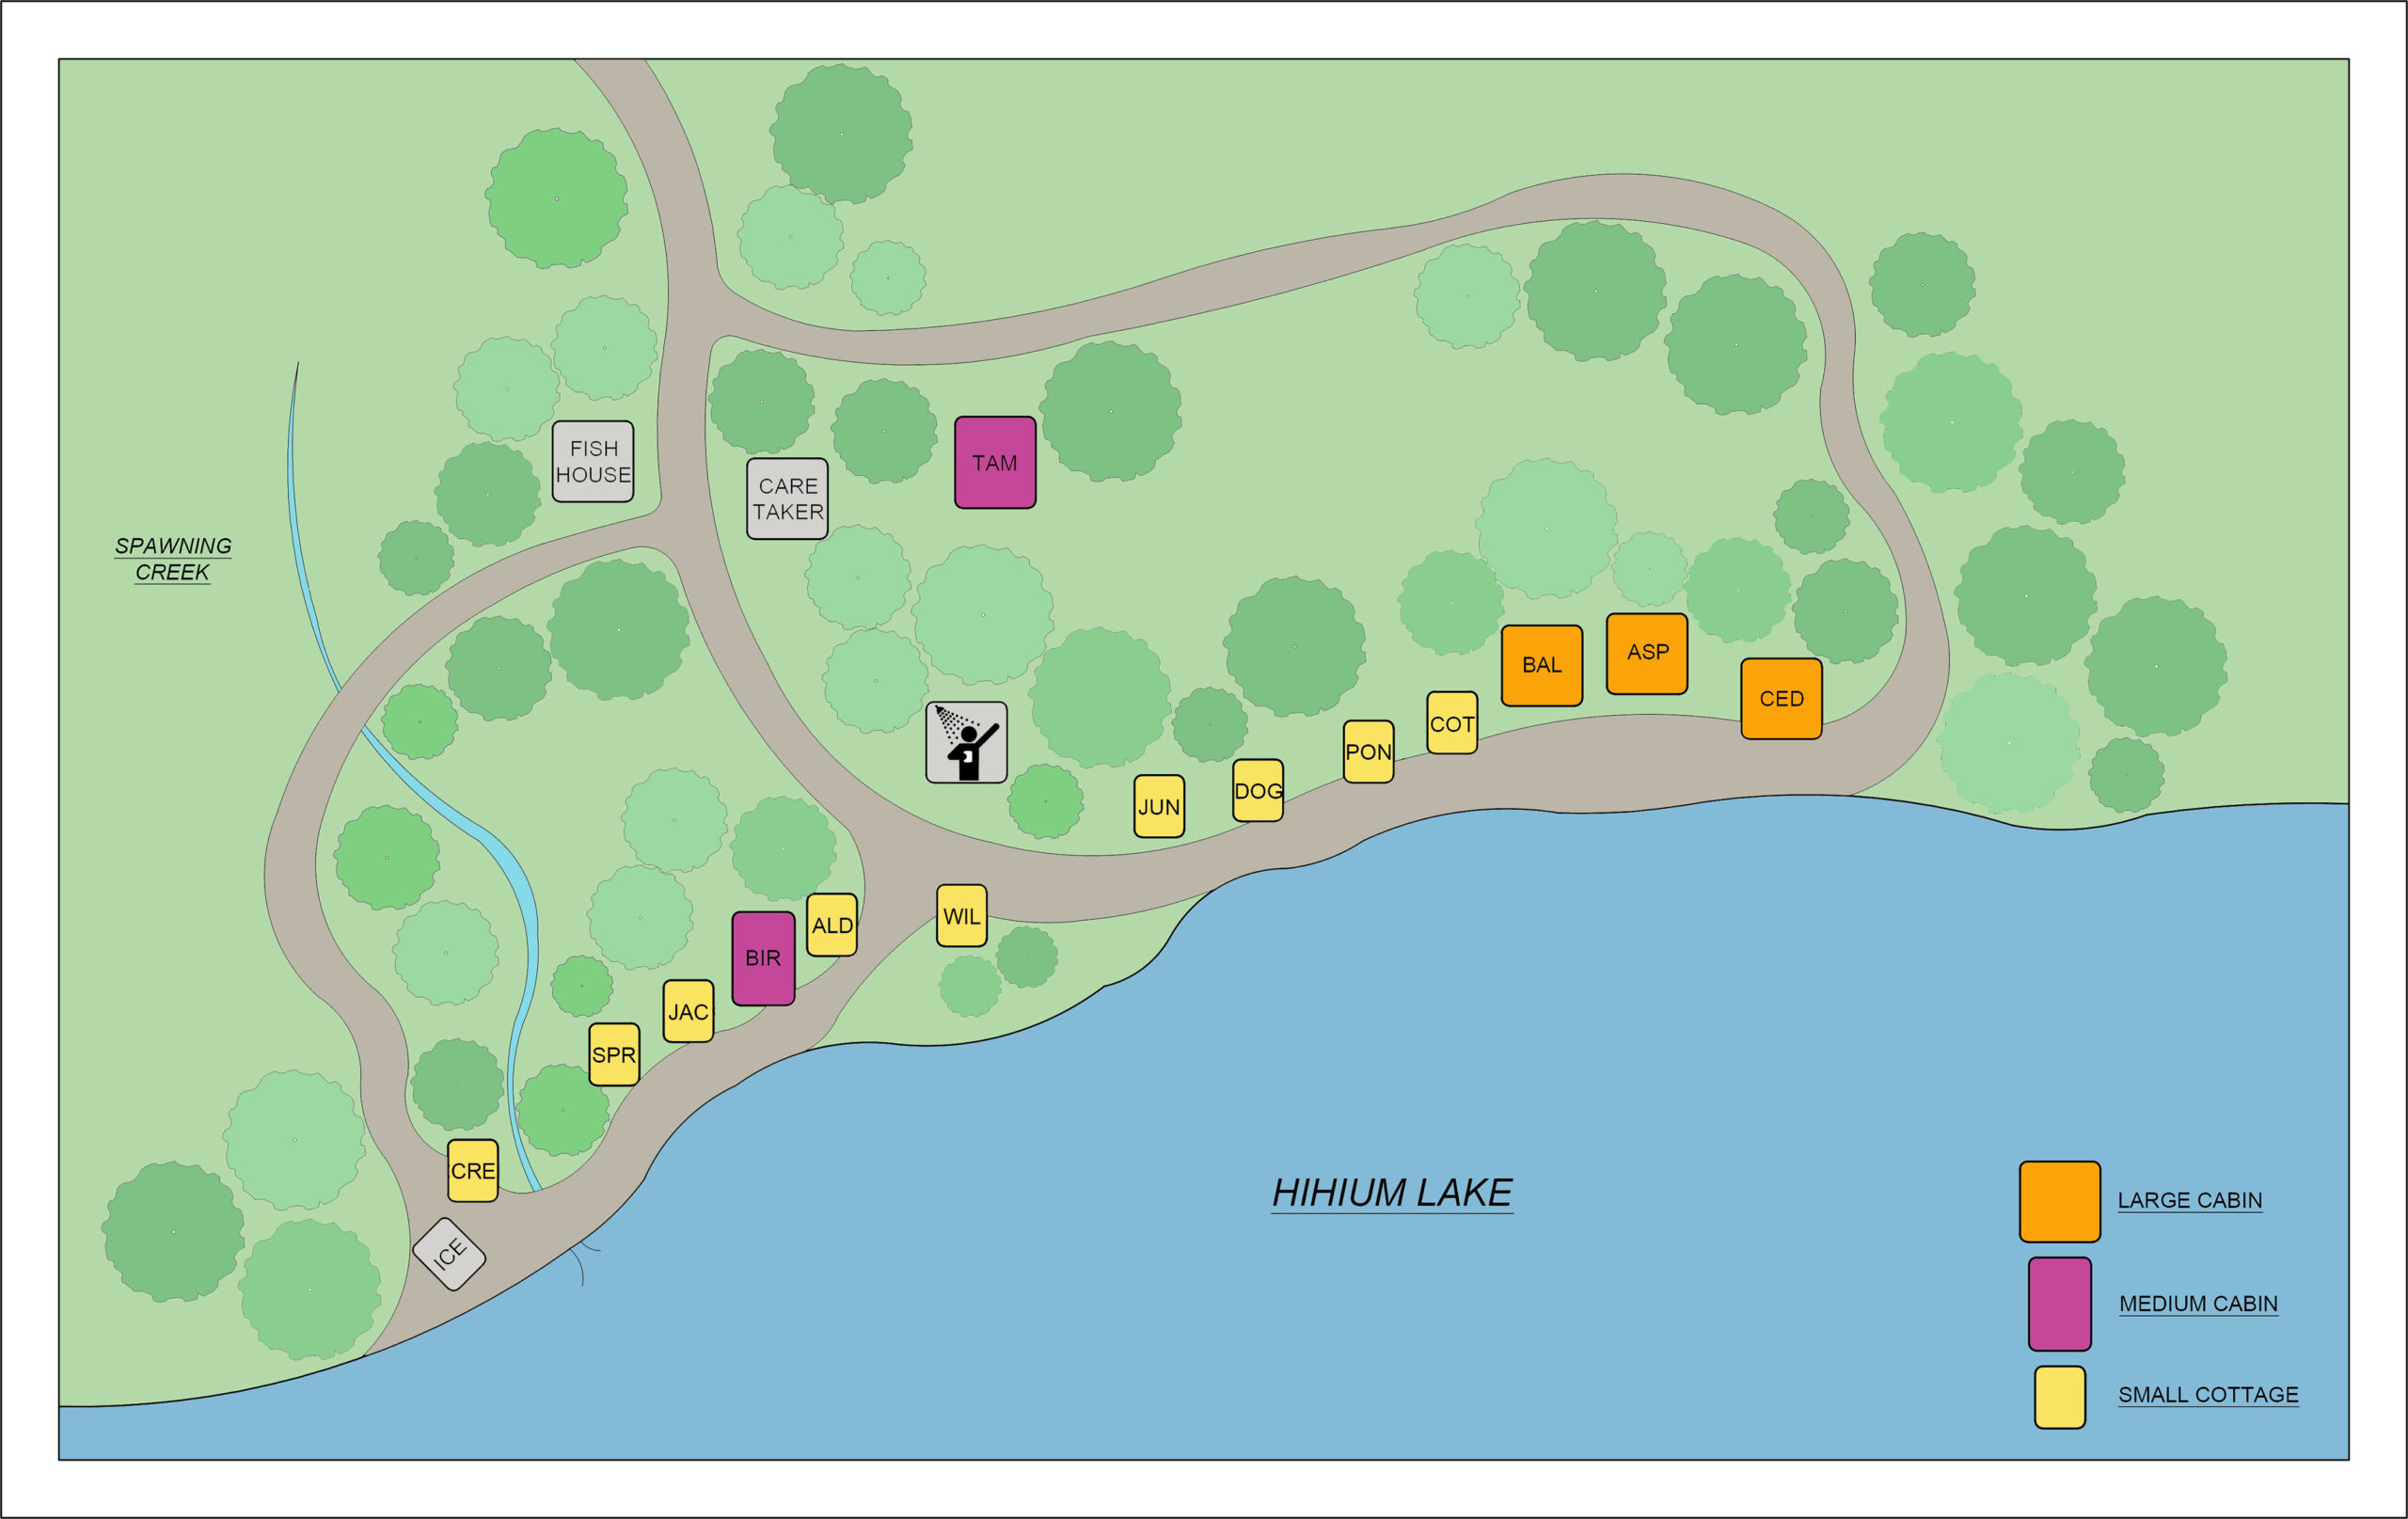 HiHium Map